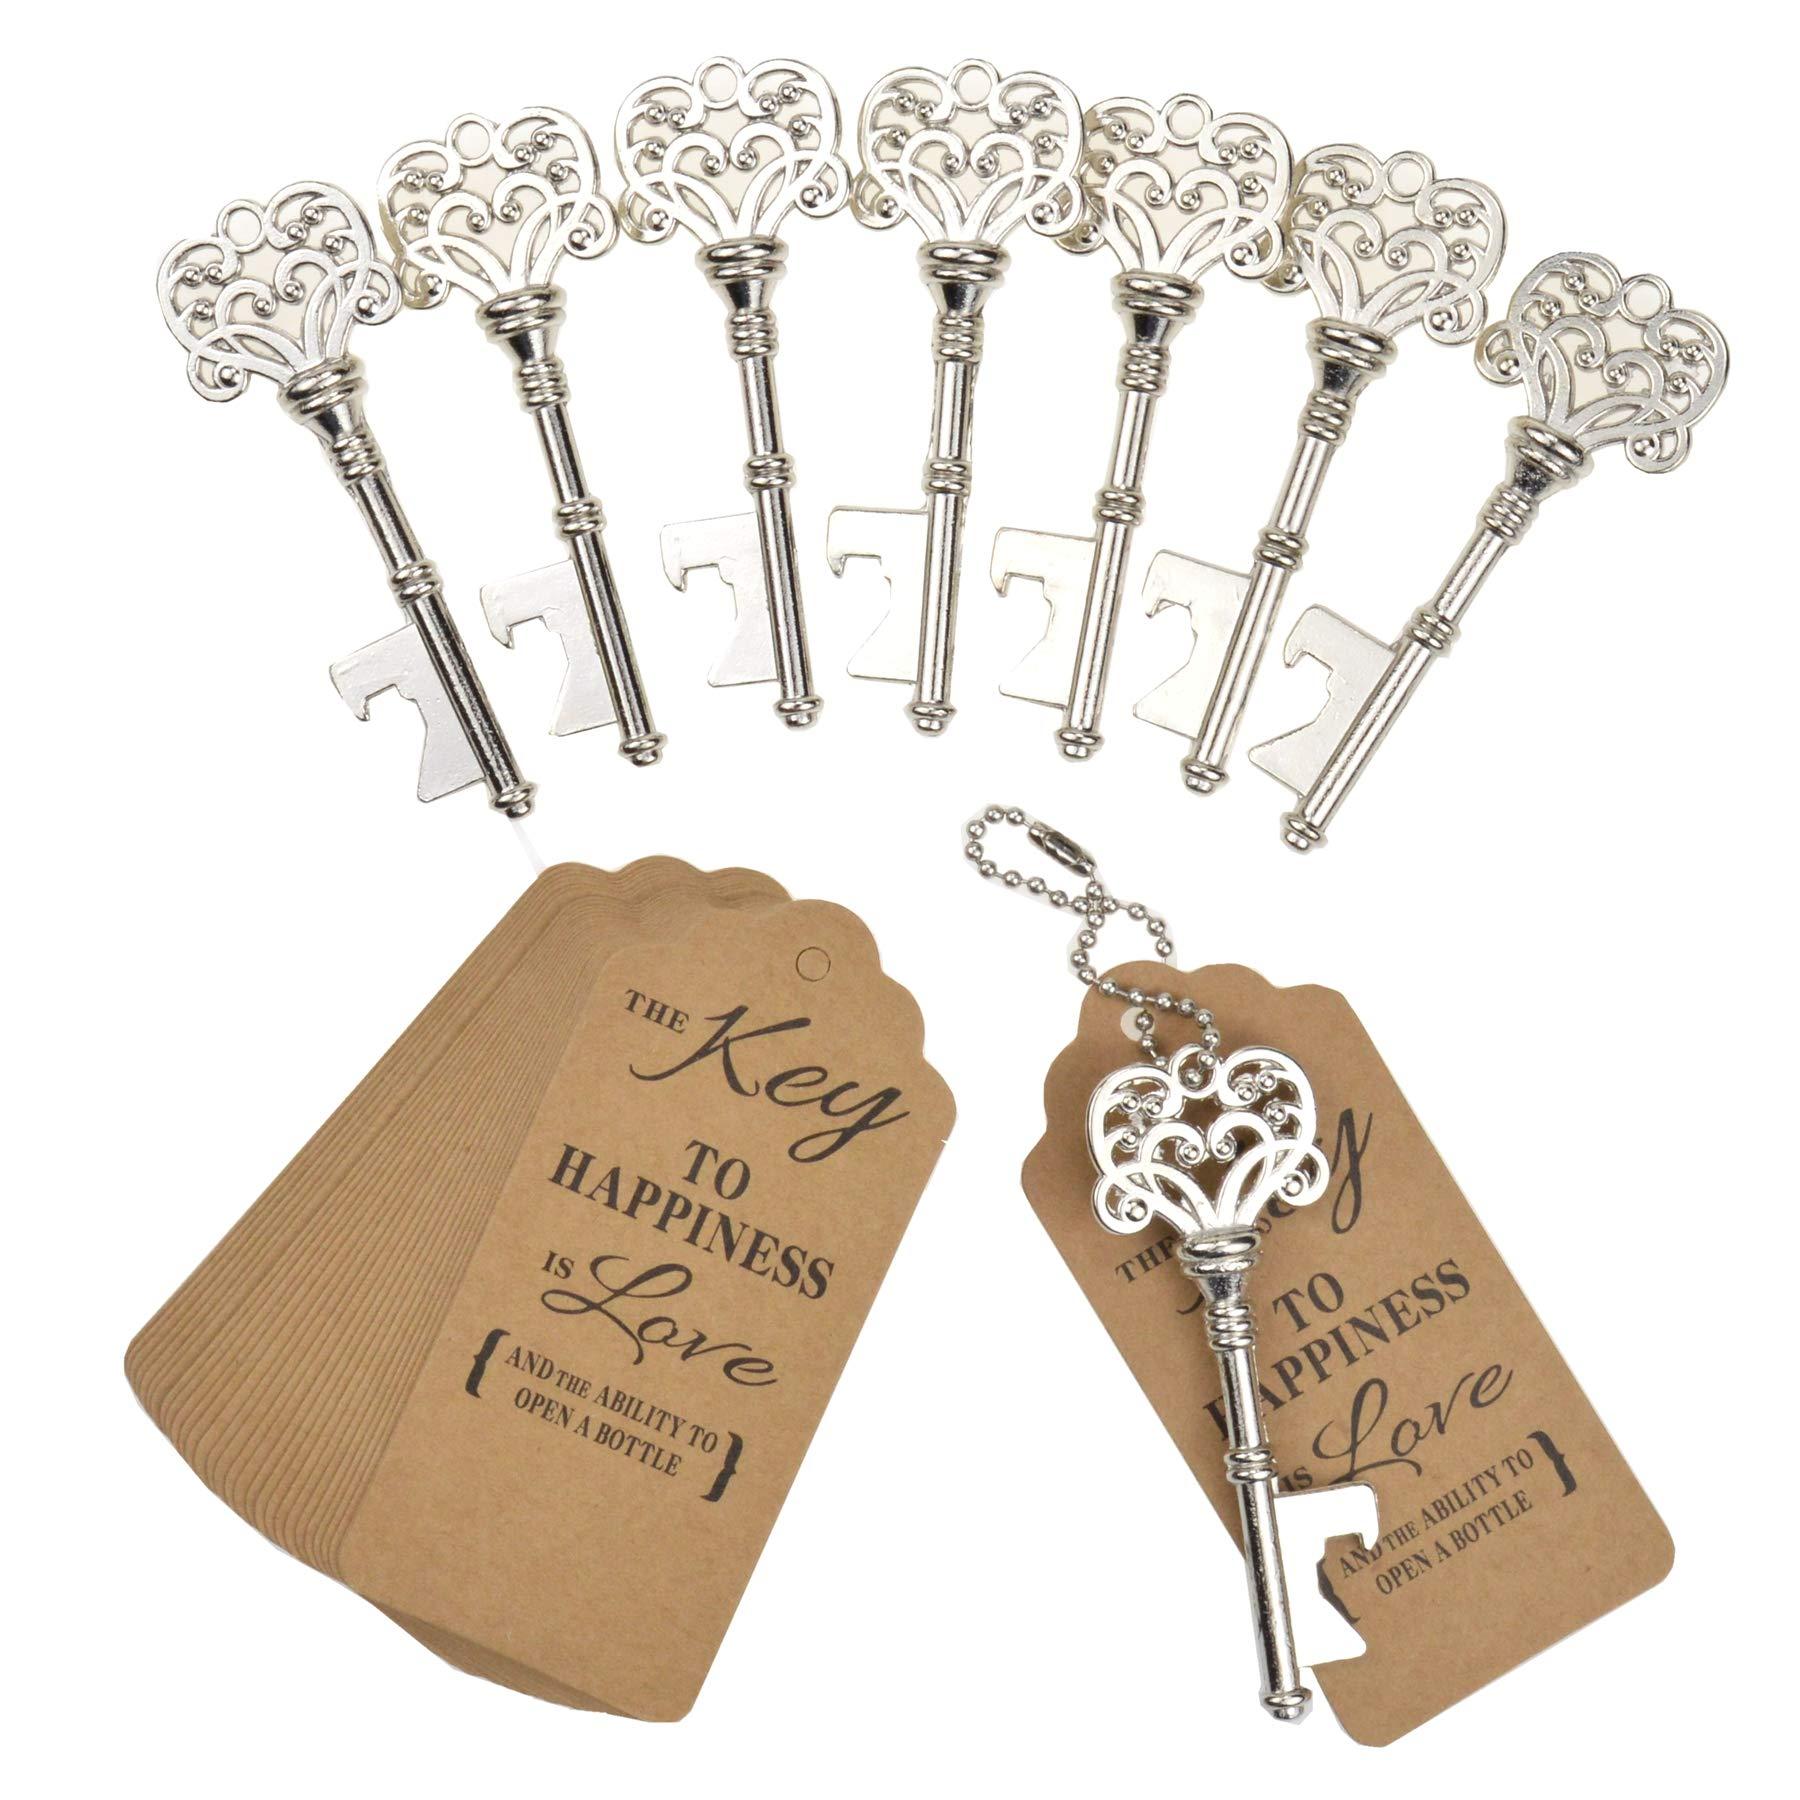 DerBlue 60 PCS Key Bottle Openers,Vintage Skeleton Key Bottle Opener,Skeleton Key Bottle Openers Wedding Favors Antique Rustic Decoration with Heart shaped kraft paper label card (Silver-4)